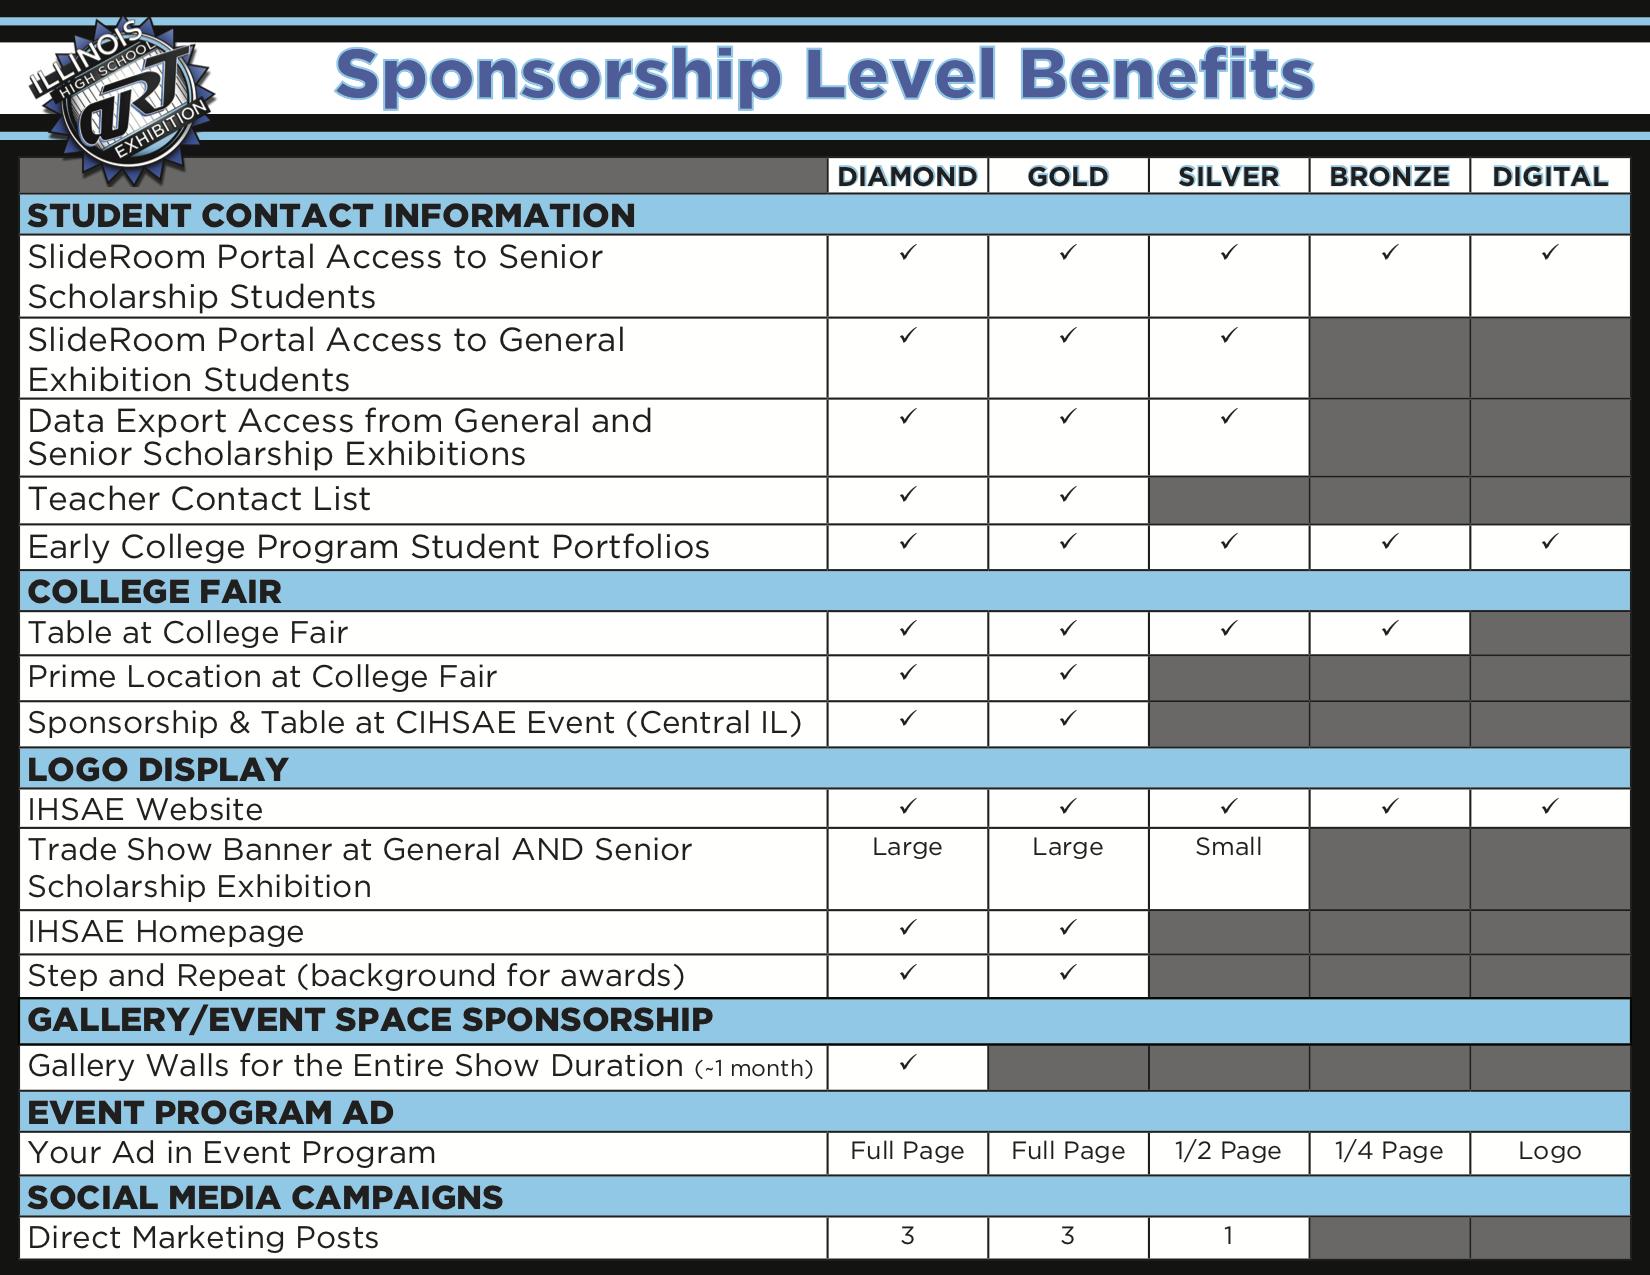 2019_FINAL V2 Diamond Brochure Sponosorship Benefits Revised 2019 w diamond.png